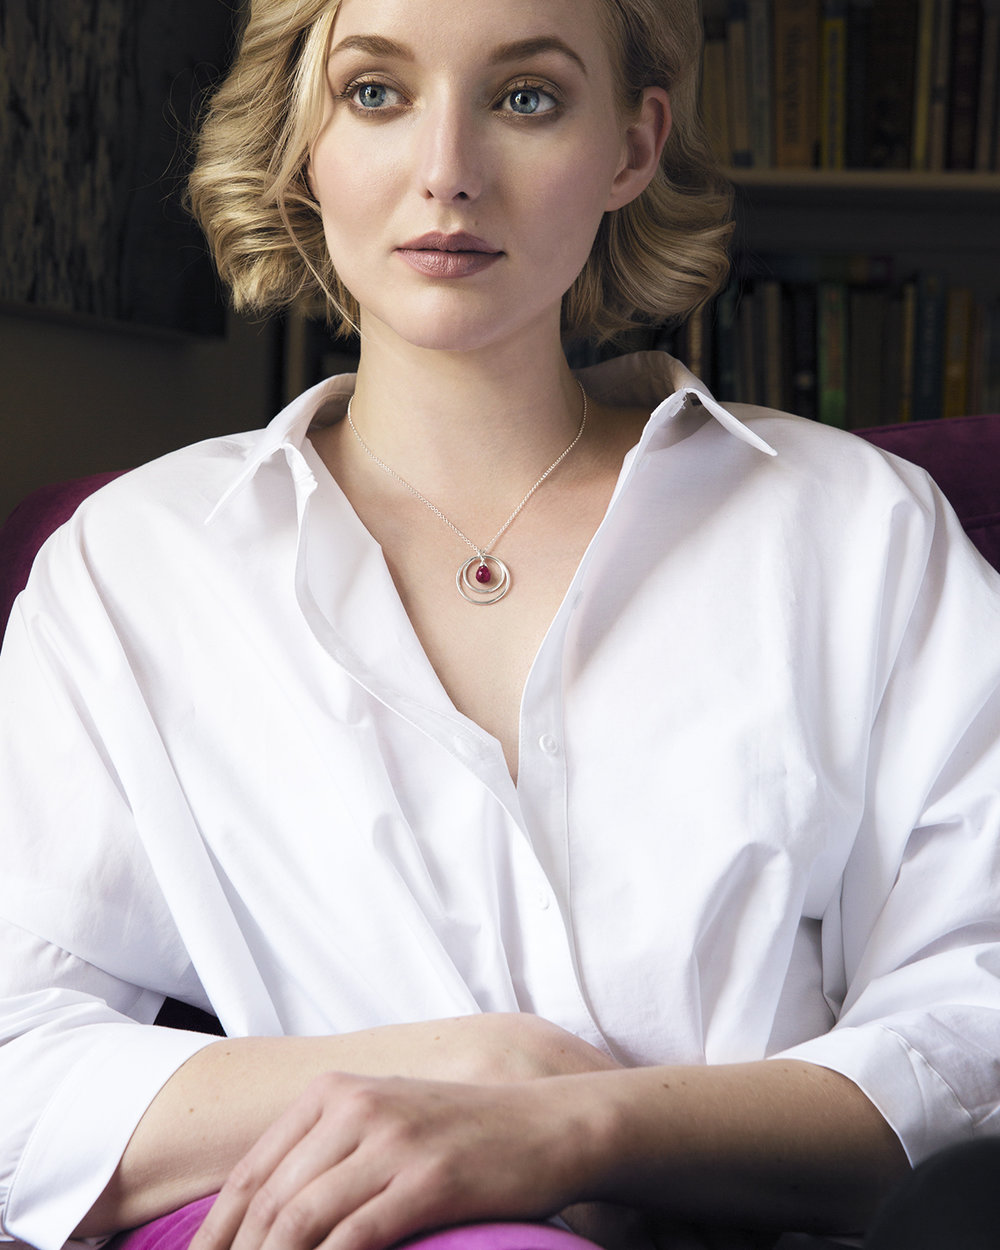 Photographer Egle Vasi, Monsterful Photo  Model Emily Lune  Honey Willow Jewellery